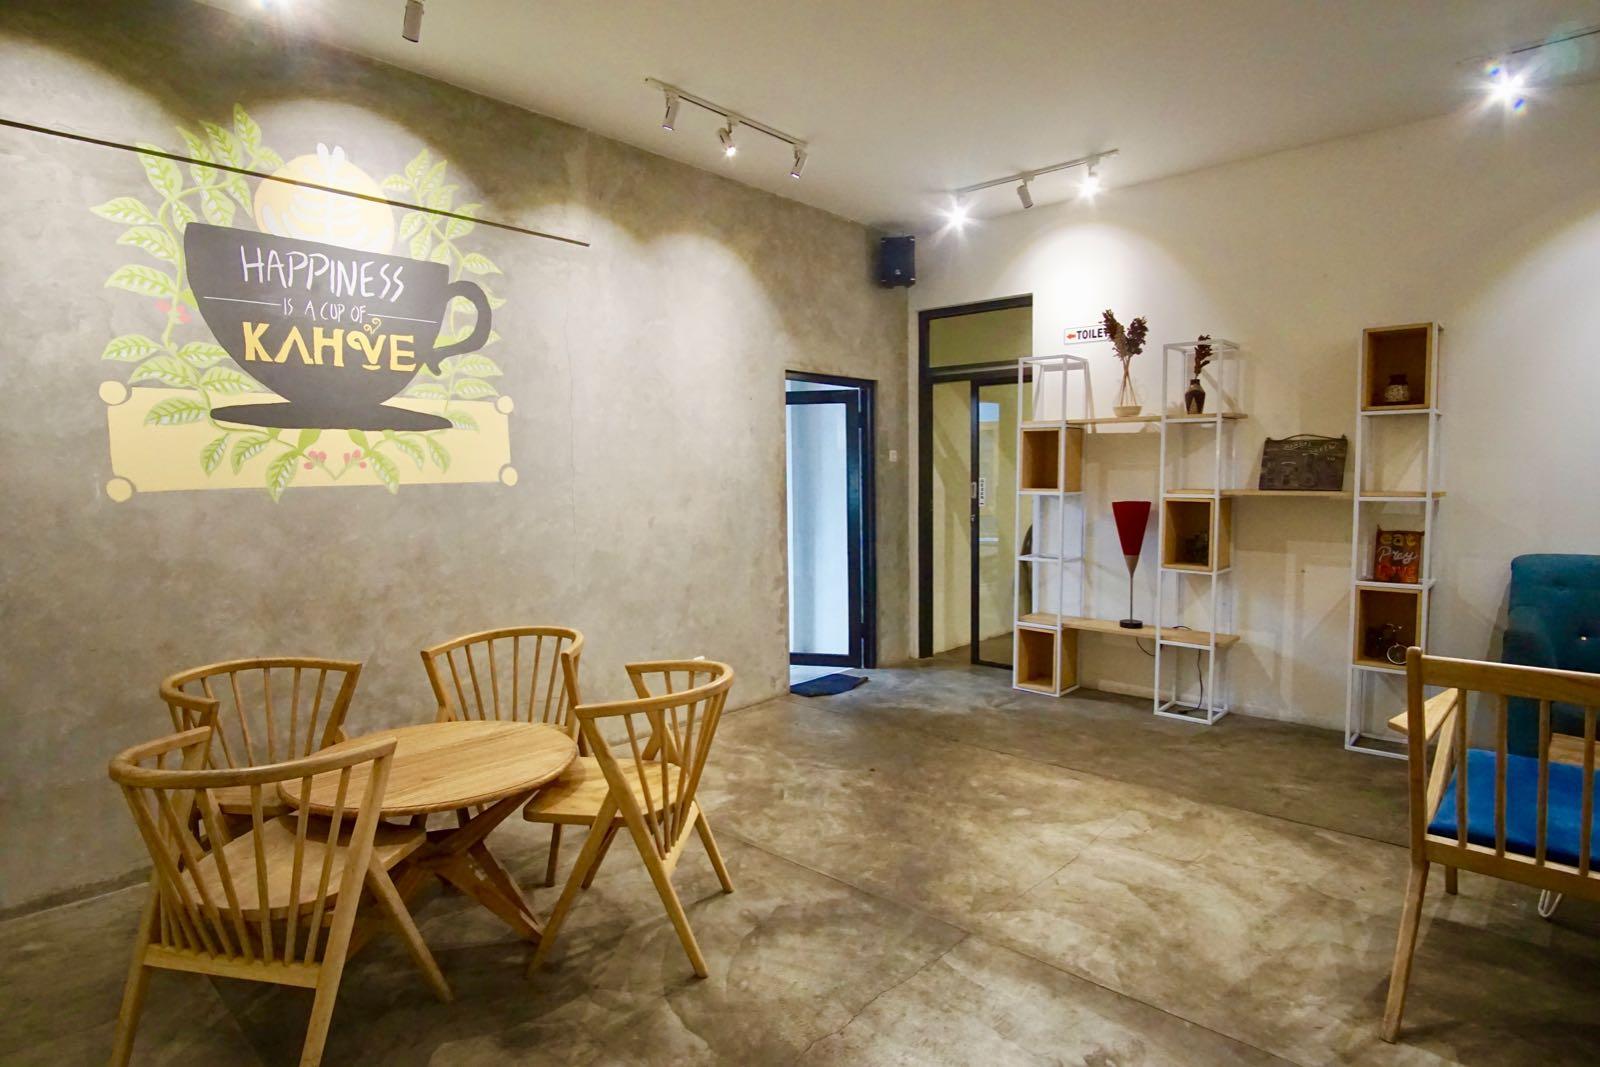 Interior Kahve Bandung